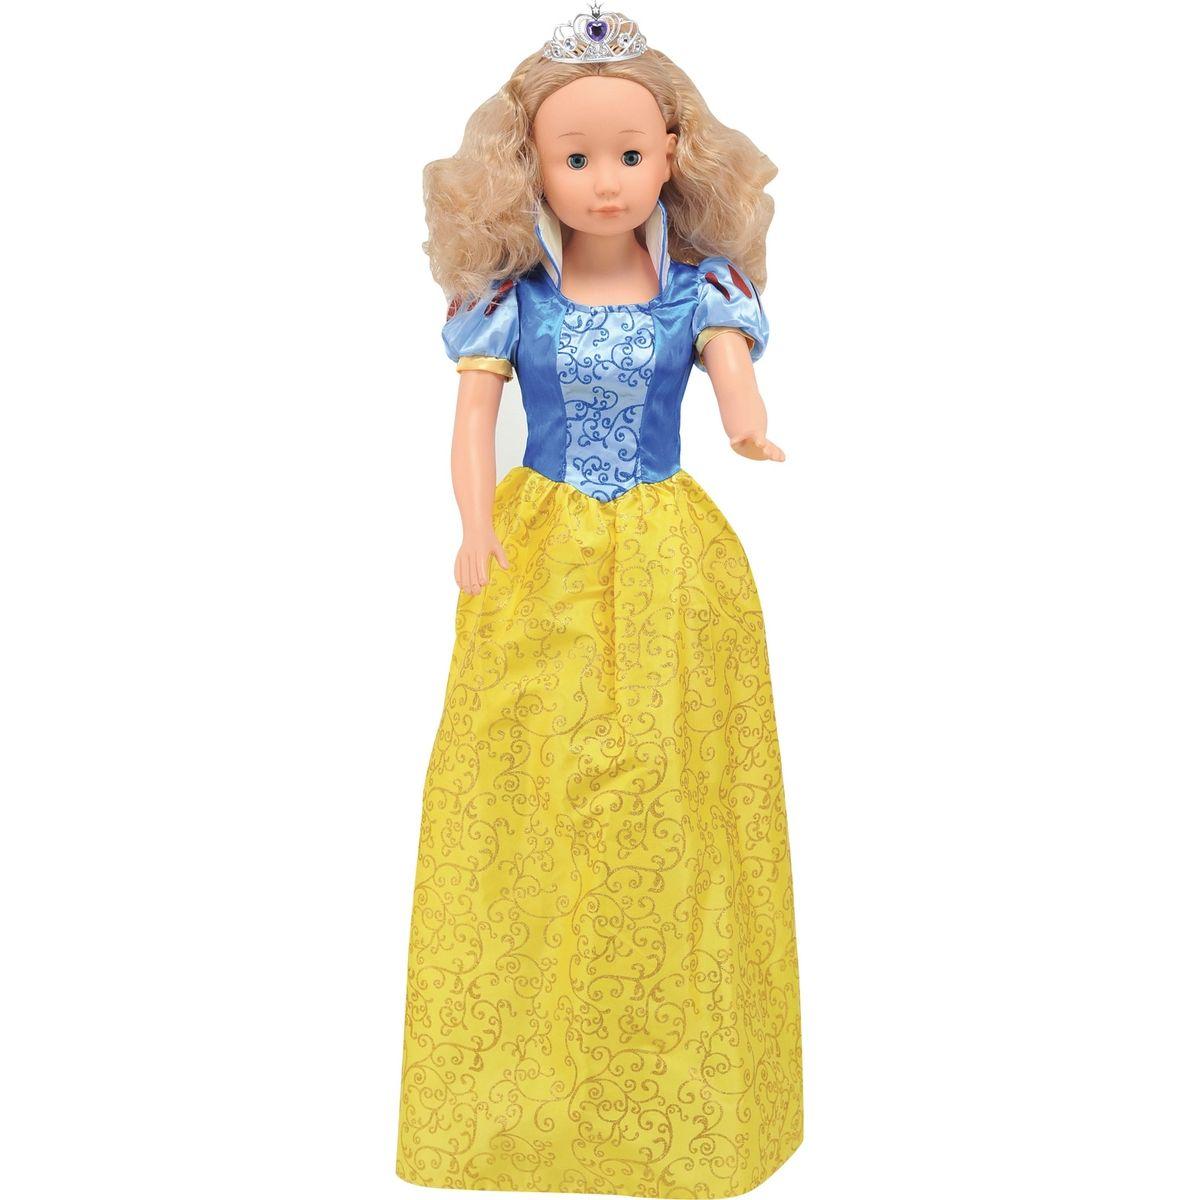 Dimian Panenka Bambolina Molly princezna 90cm - Žluto-modré šaty